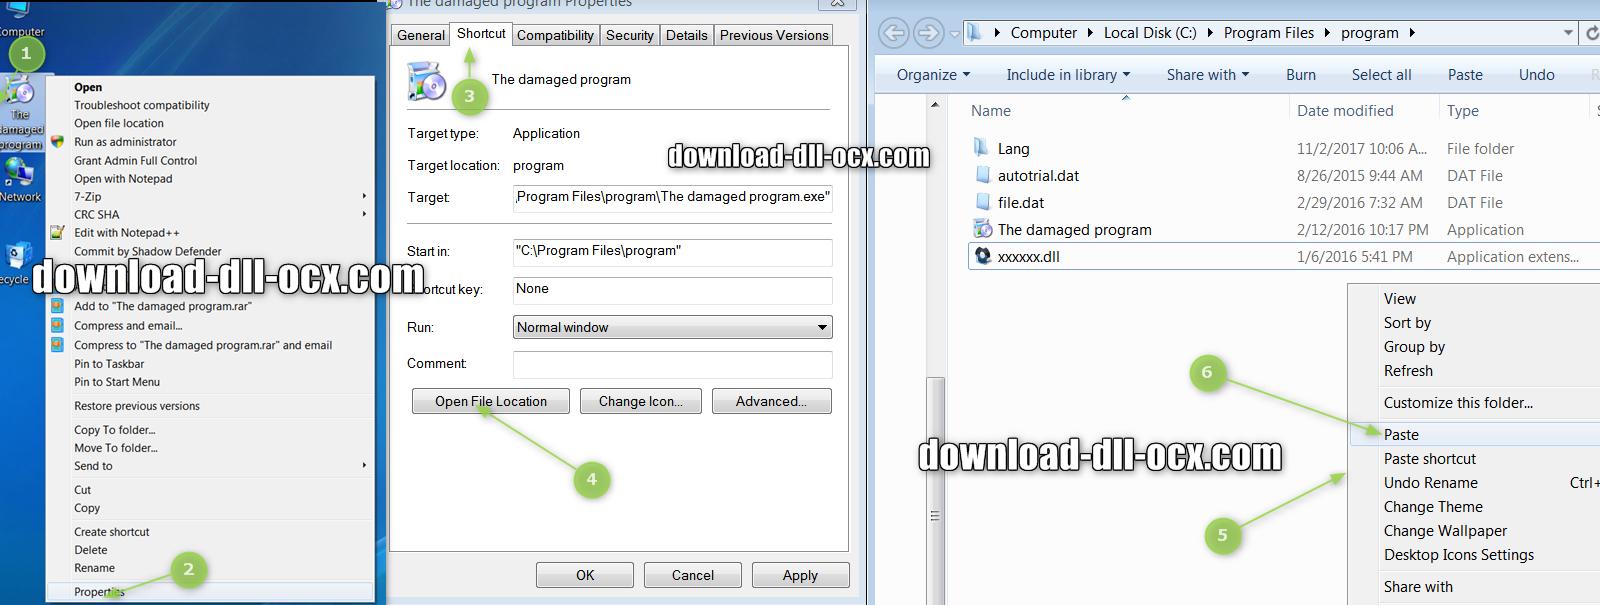 how to install jgitgen.dll file? for fix missing